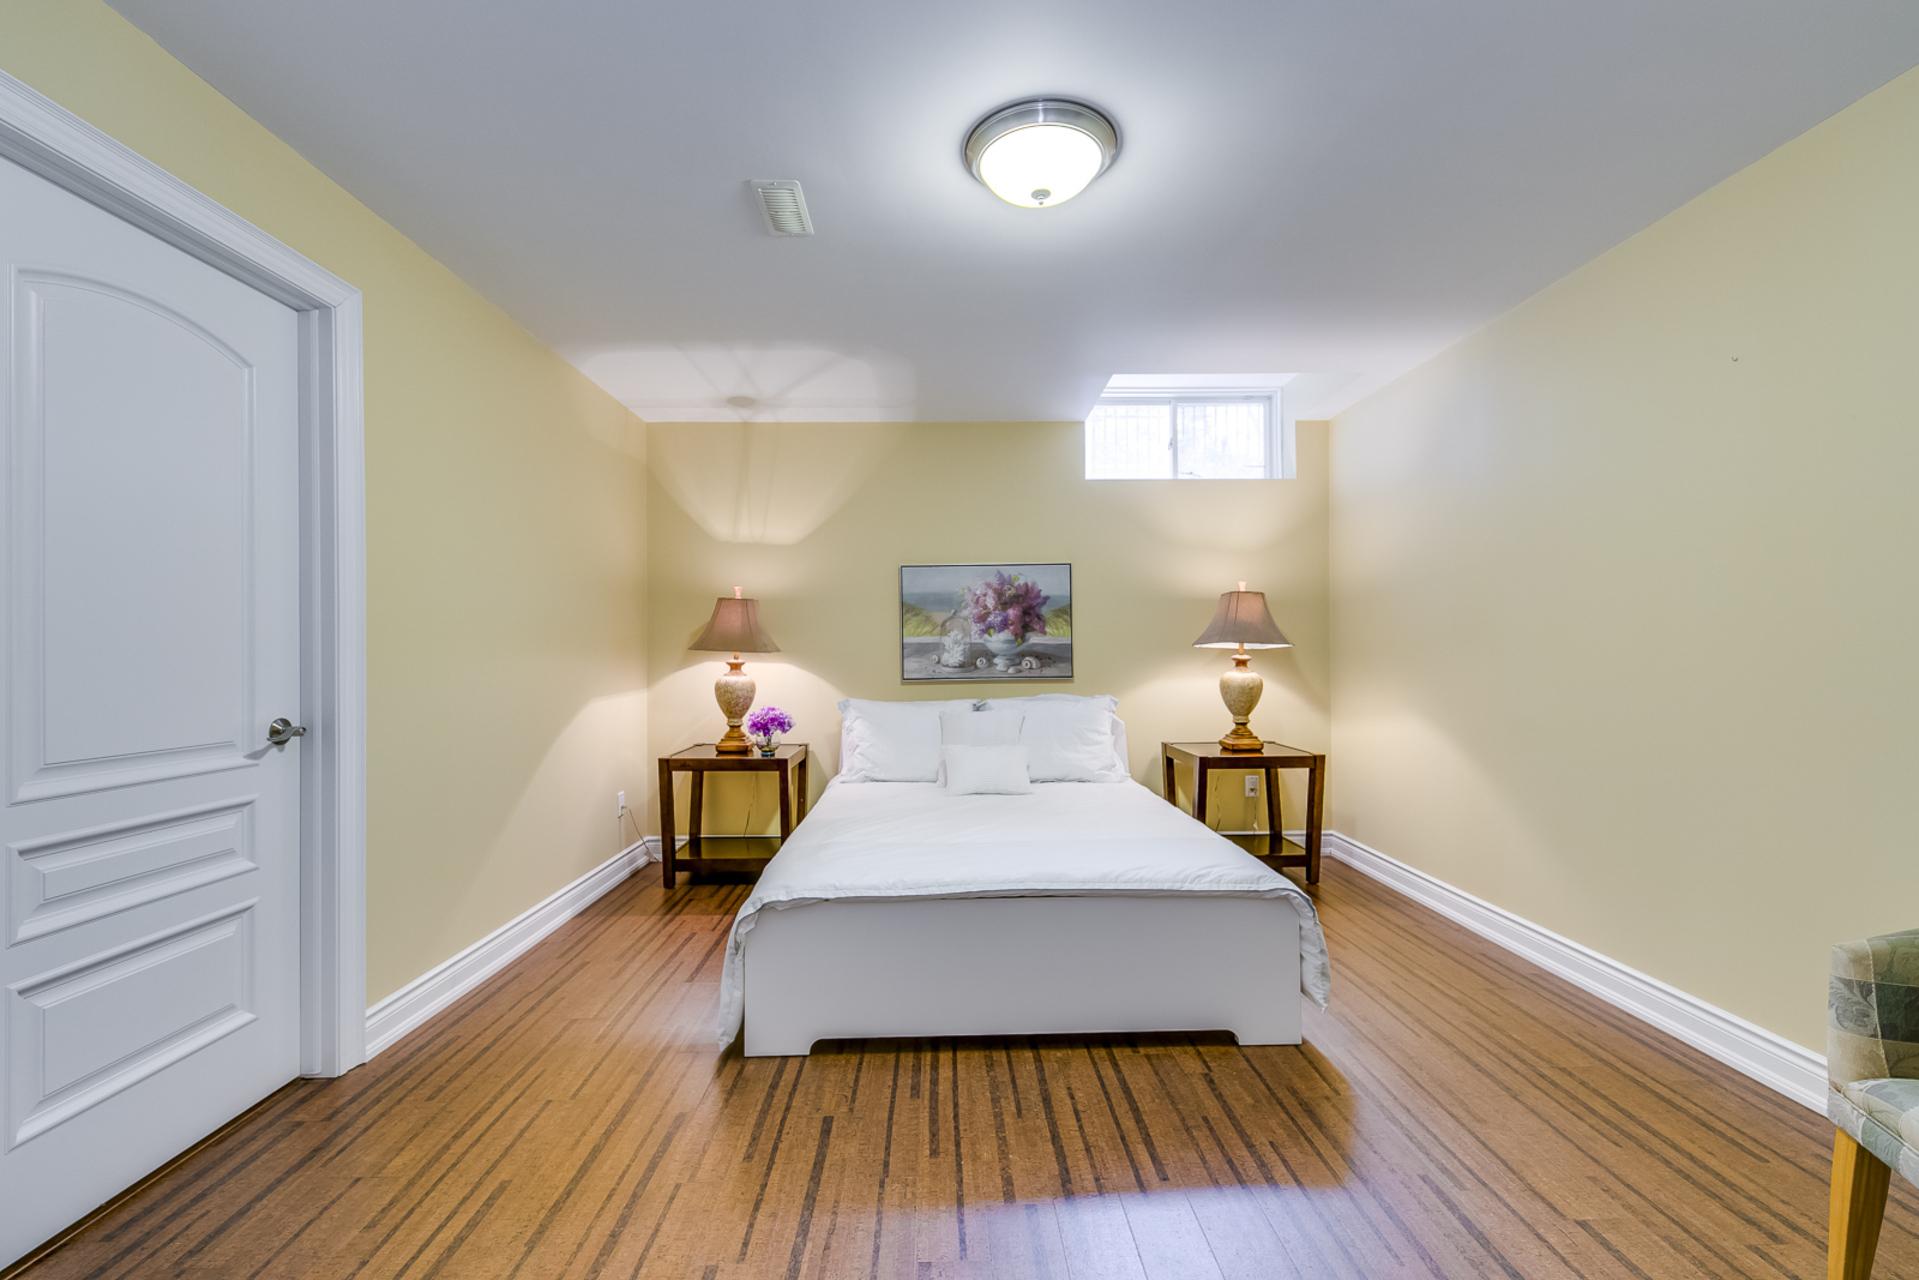 Guest Bedroom - 725 Queensway W, Mississauga - Elite3 & Team at 725 Queensway West, Erindale, Mississauga